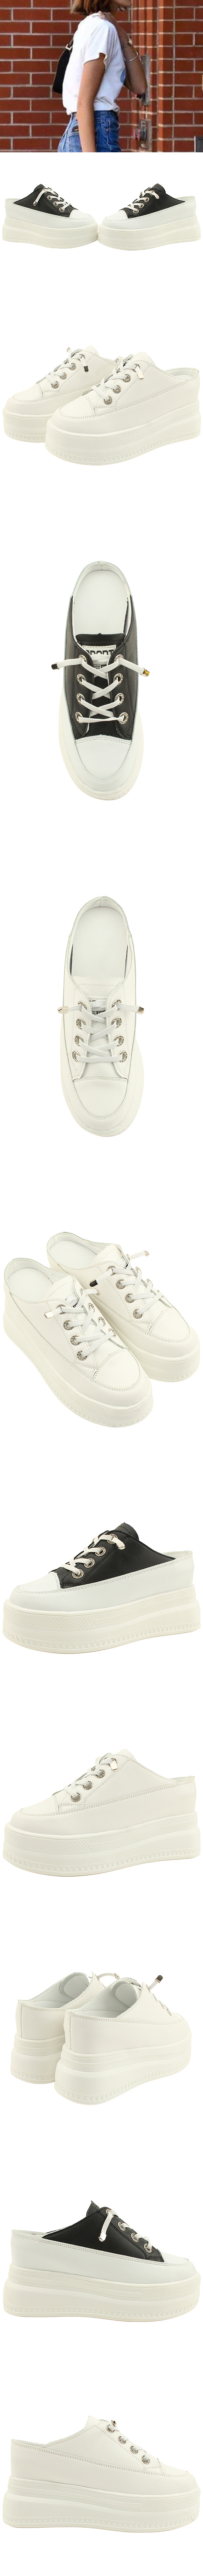 Height Shoes Sneakers Mule Slippers Black